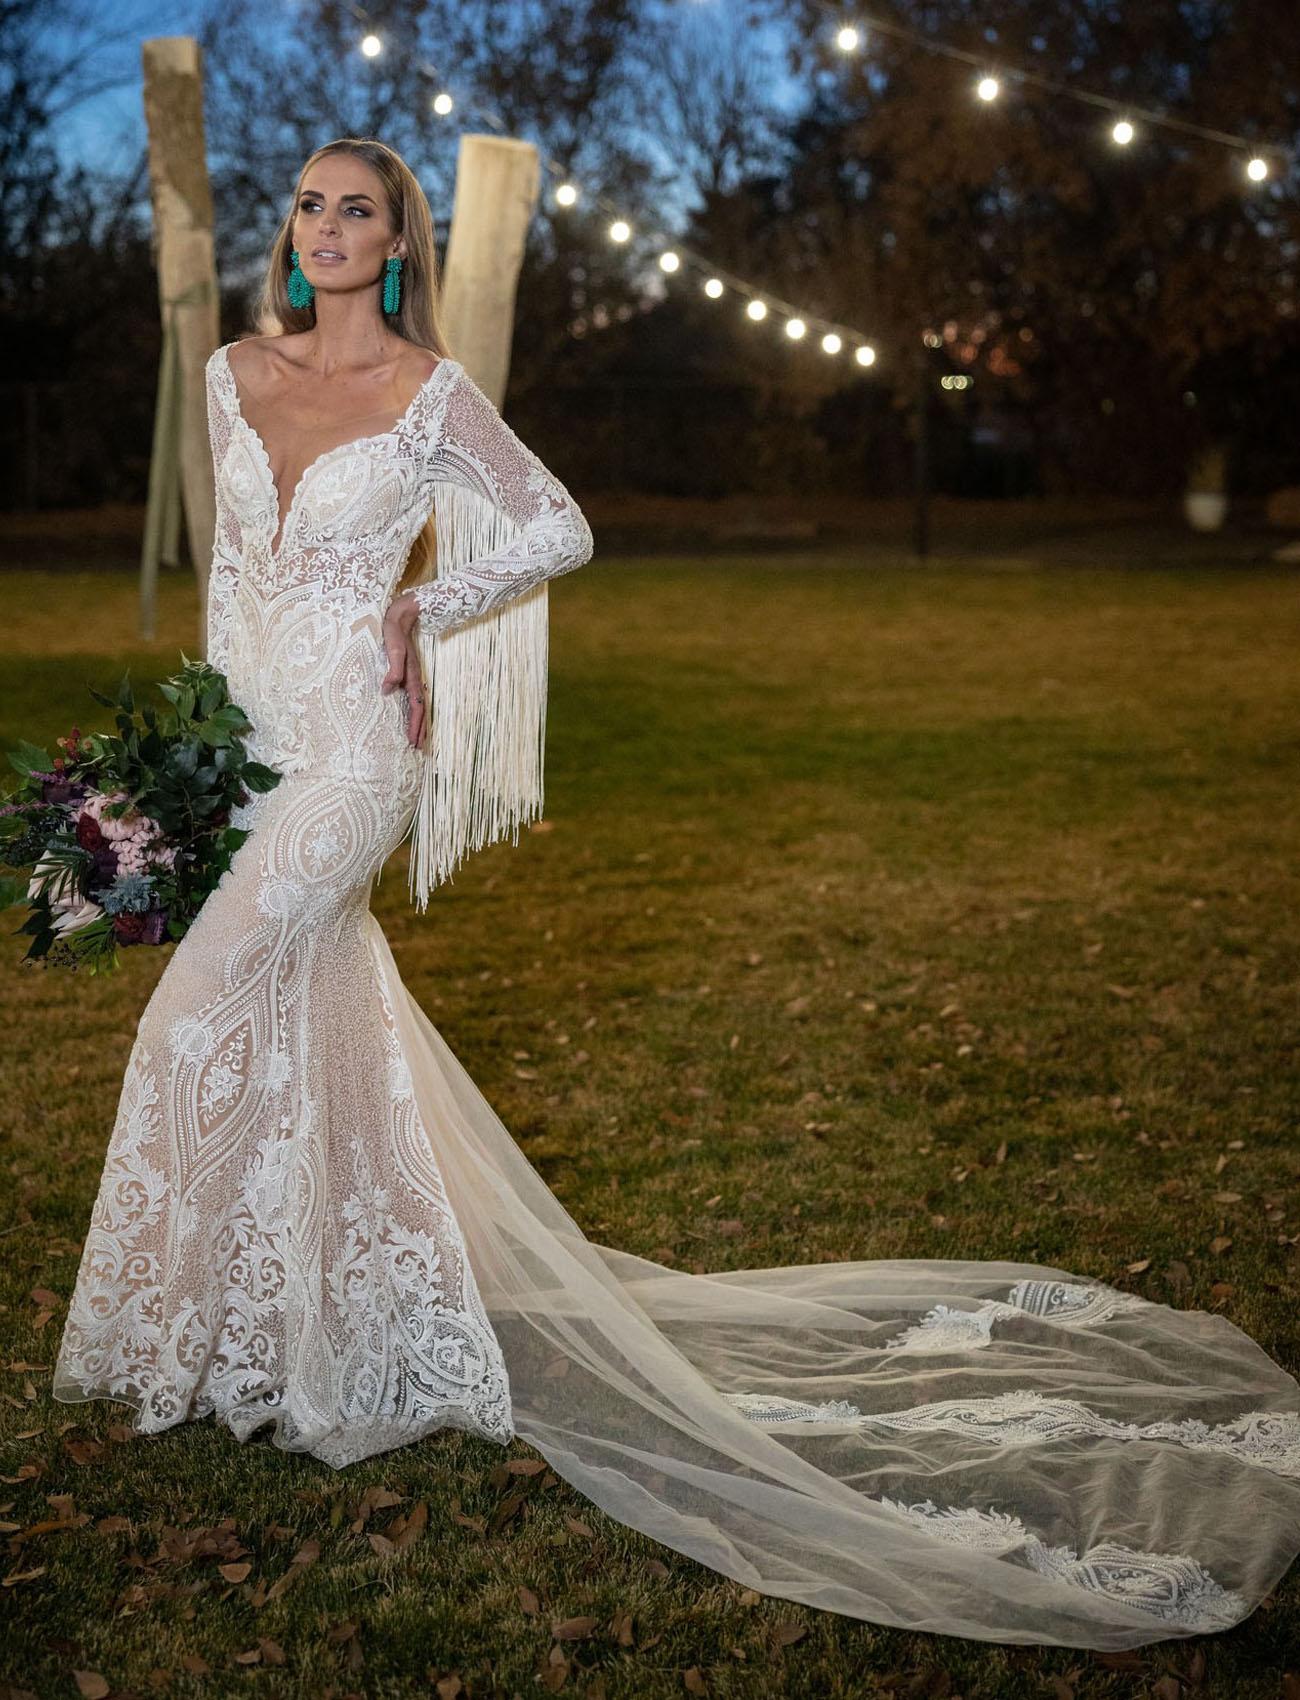 Naama & Anat Wedding Dresses